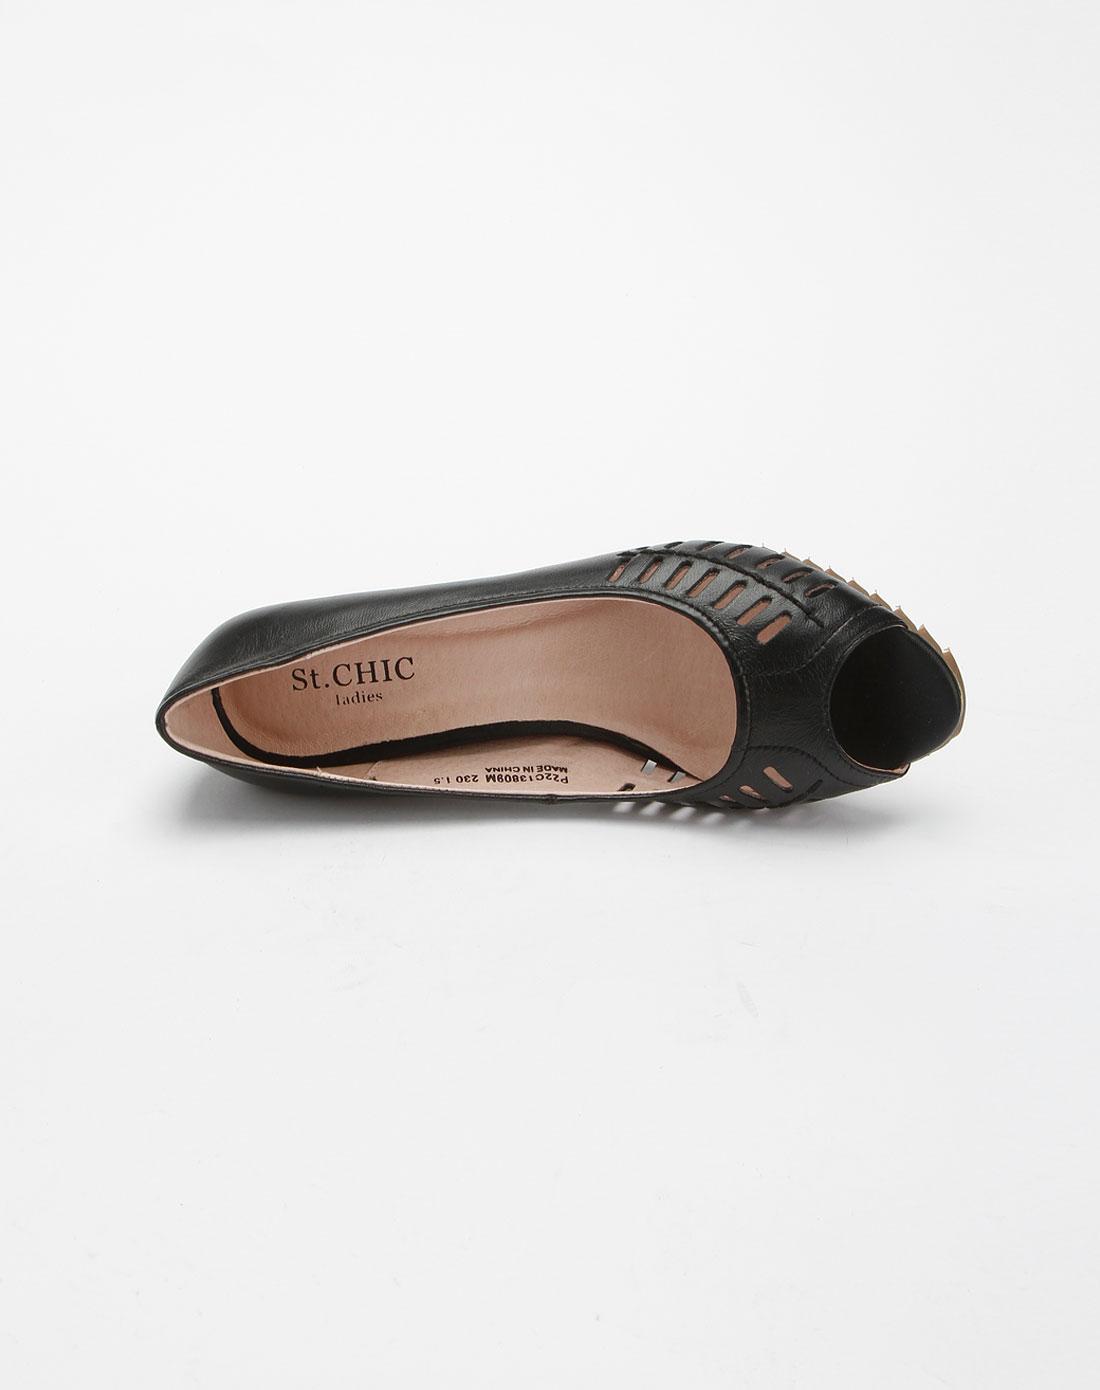 chic女款黑色鱼嘴镂空内增高凉鞋p22c13809m